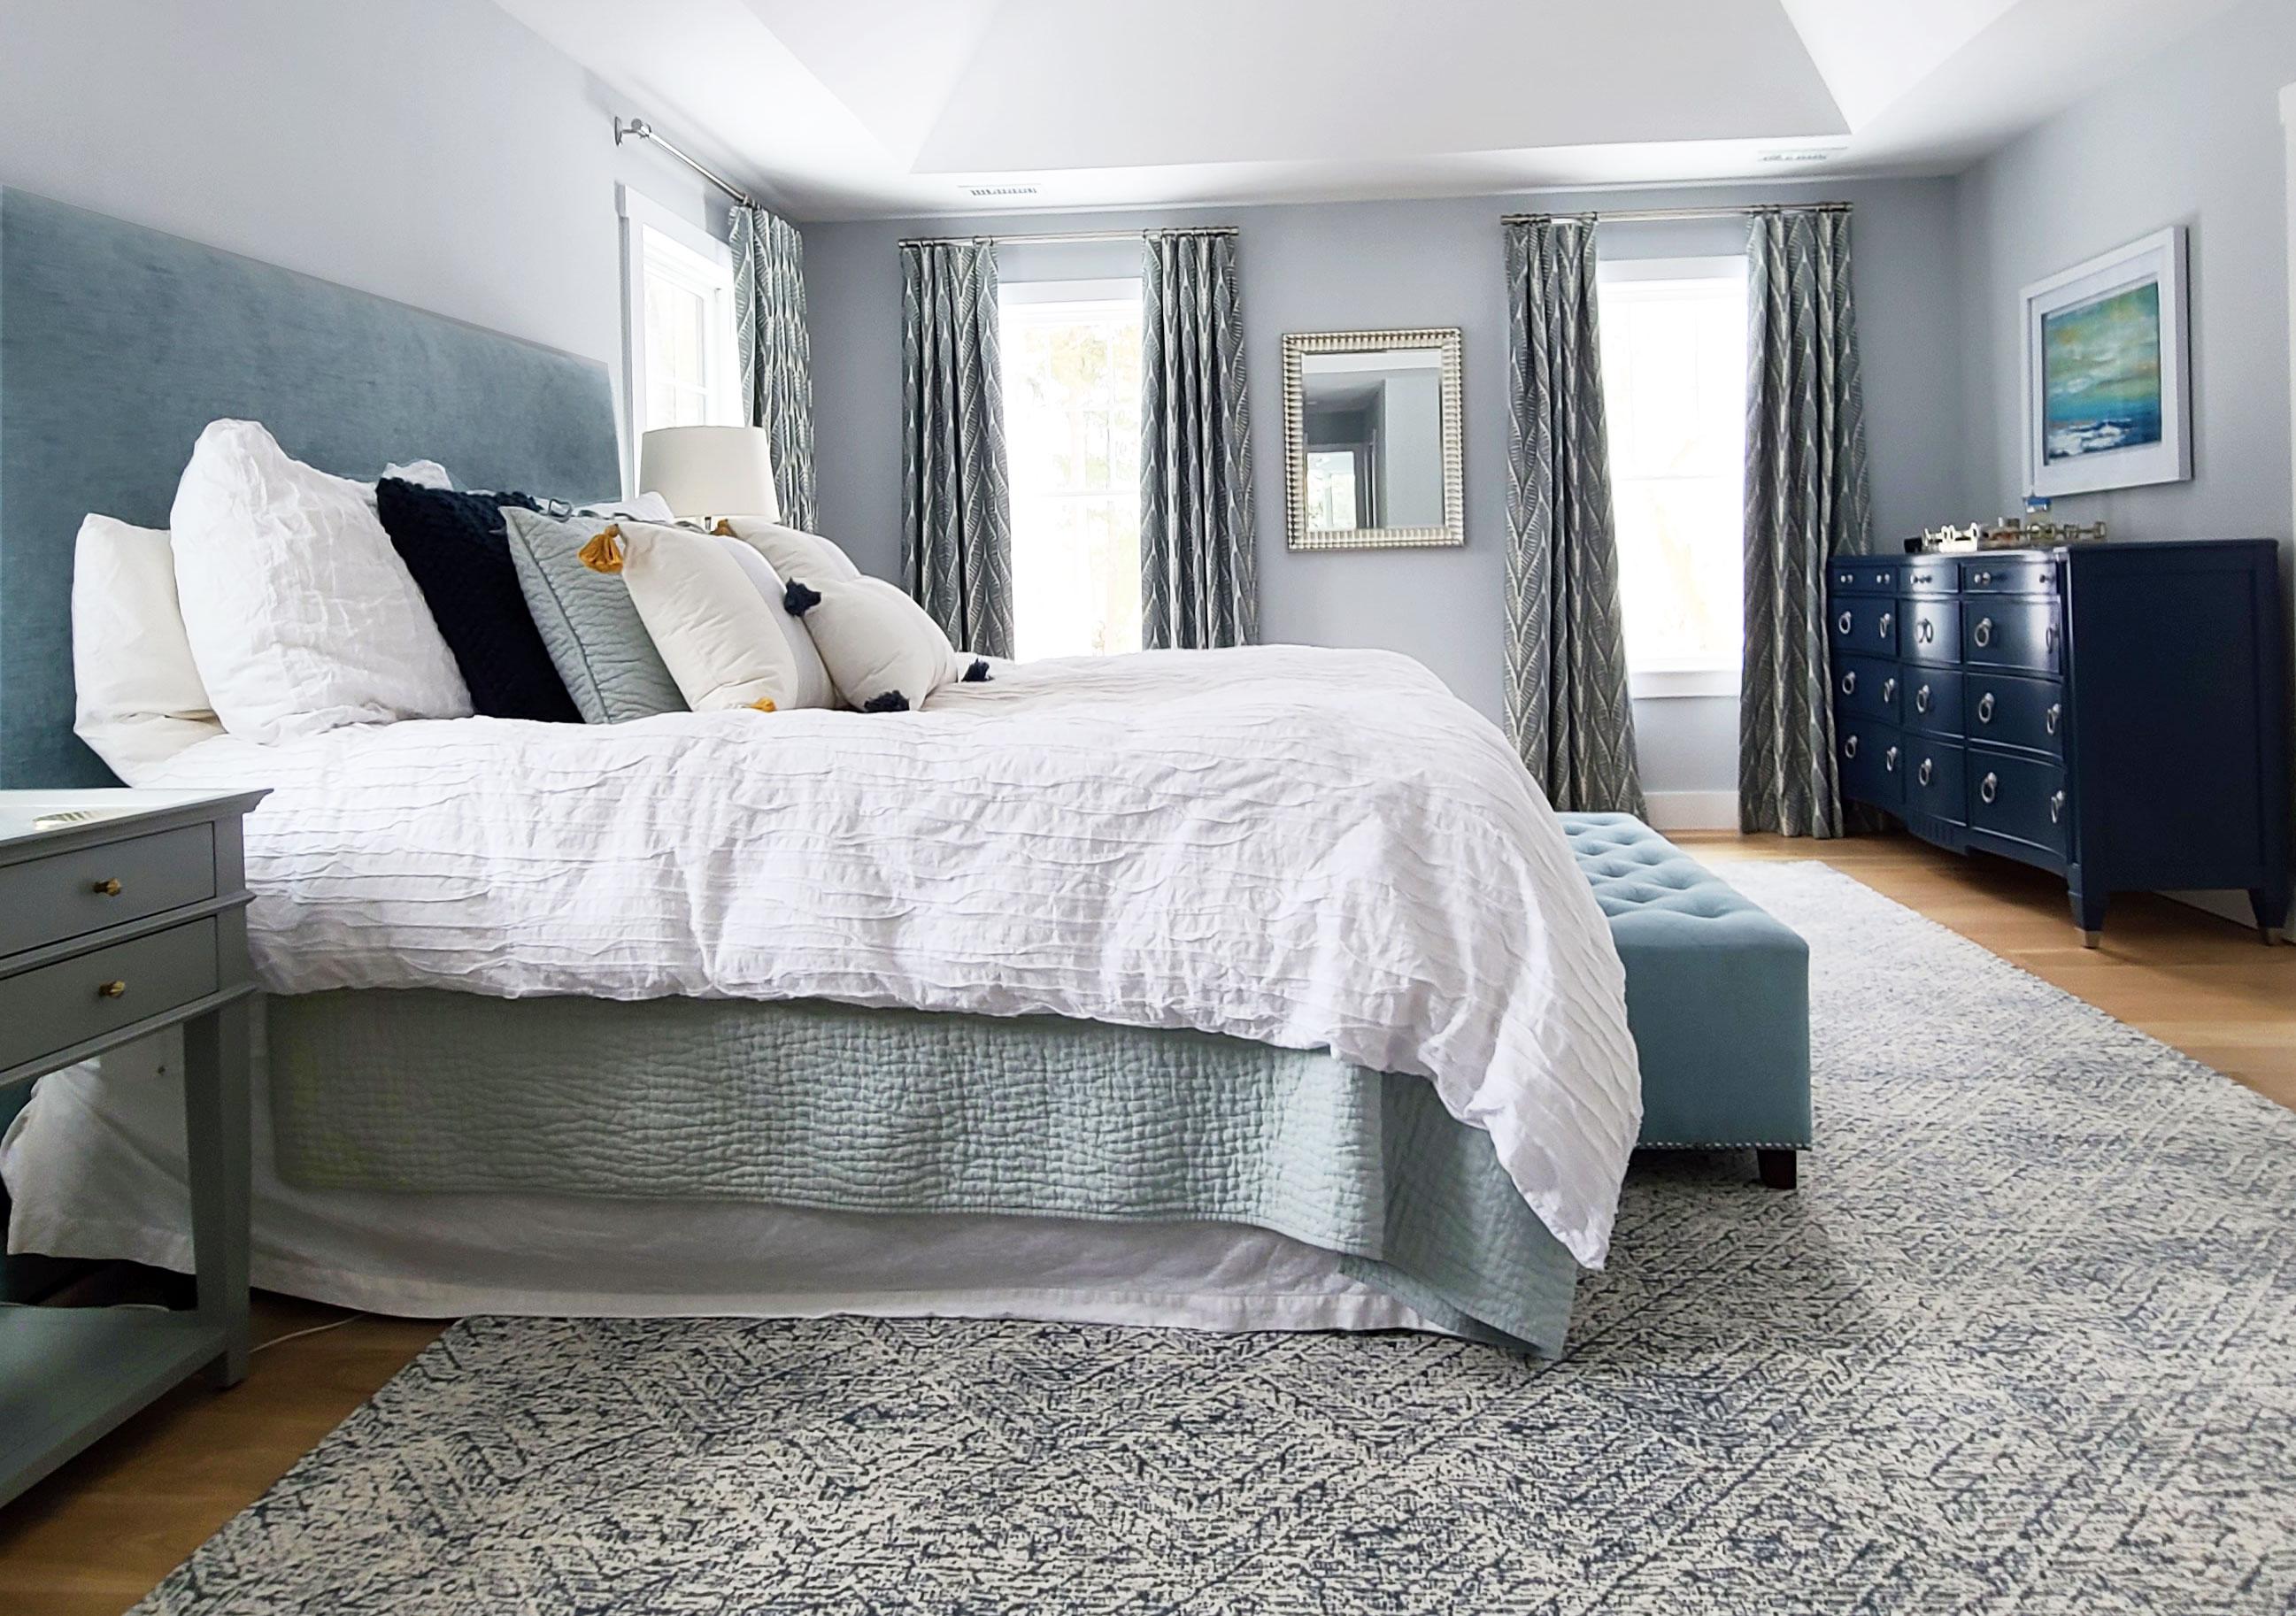 main line bedroom design, blues and greens, custom headboard, custom window treatments